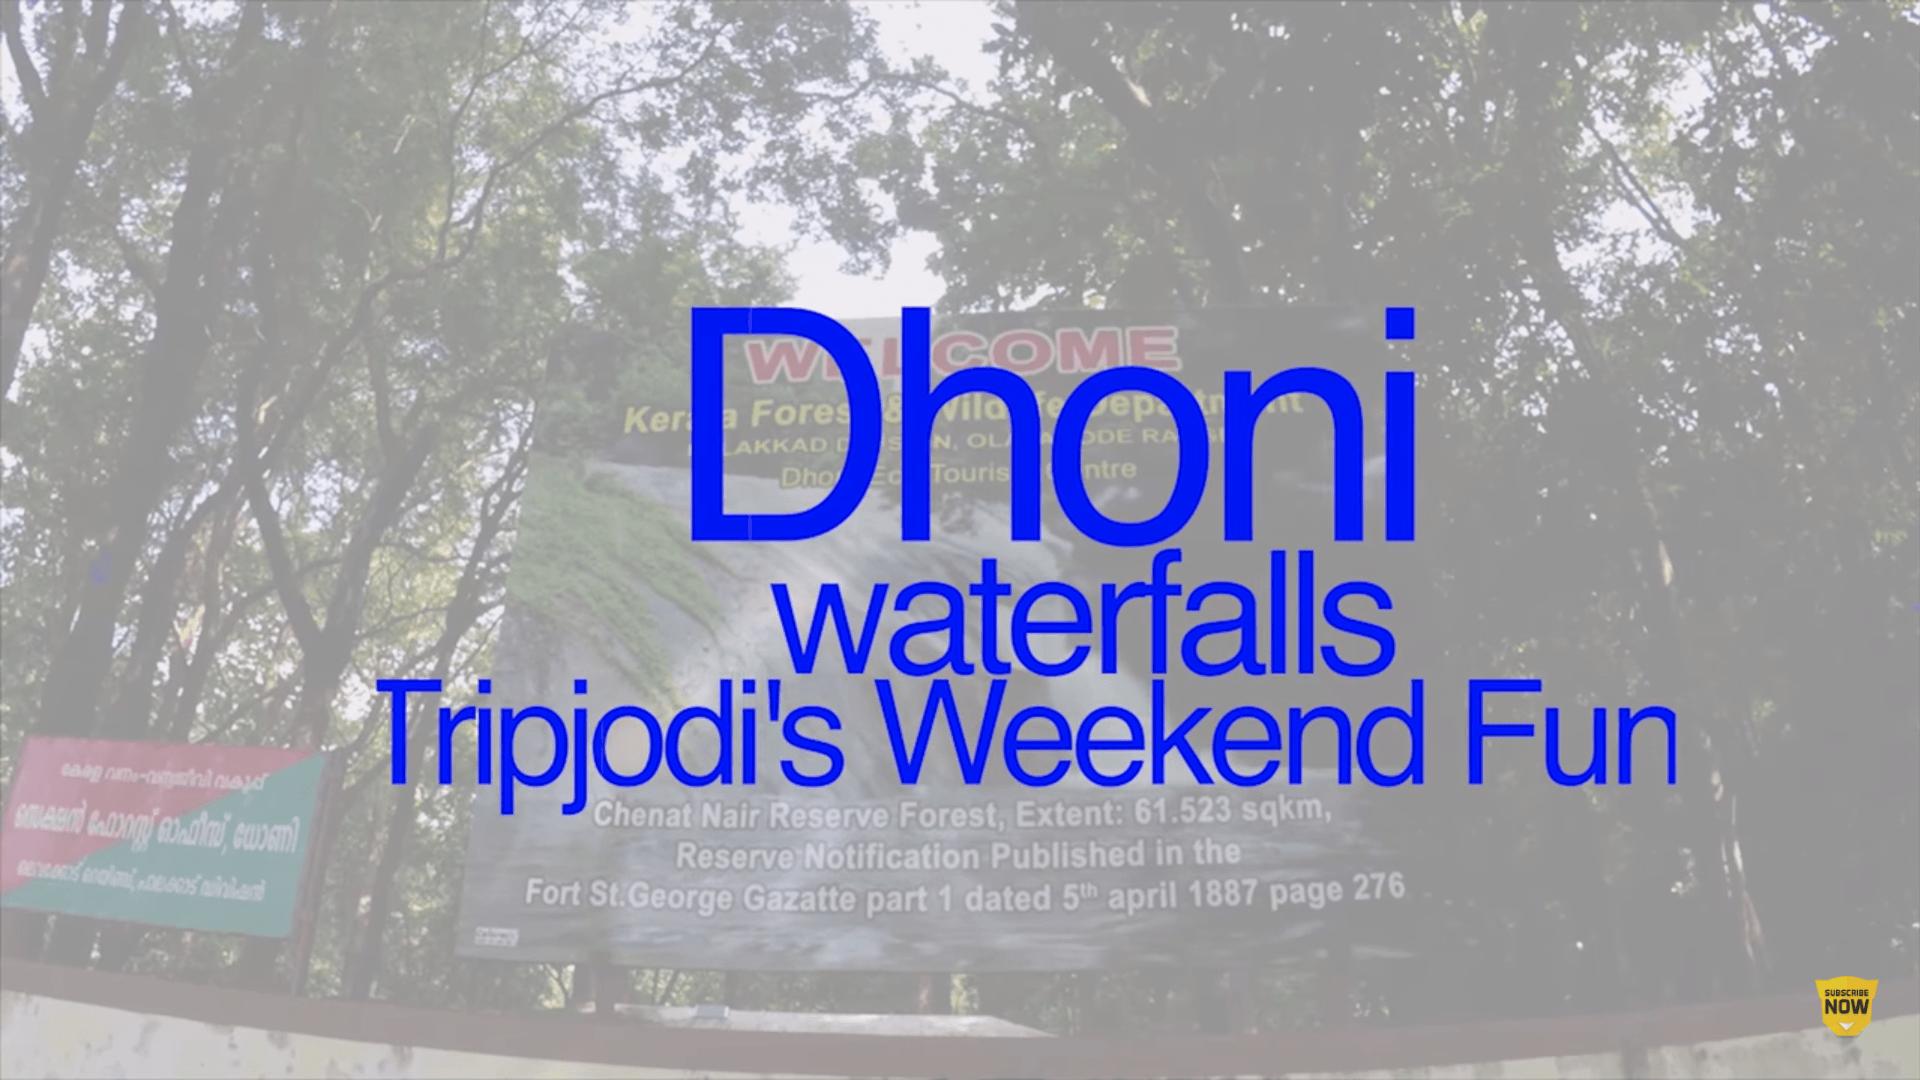 Dhoni Falls, Palakkad, Kerala – Tripjodi 's Weekend Fun Trek